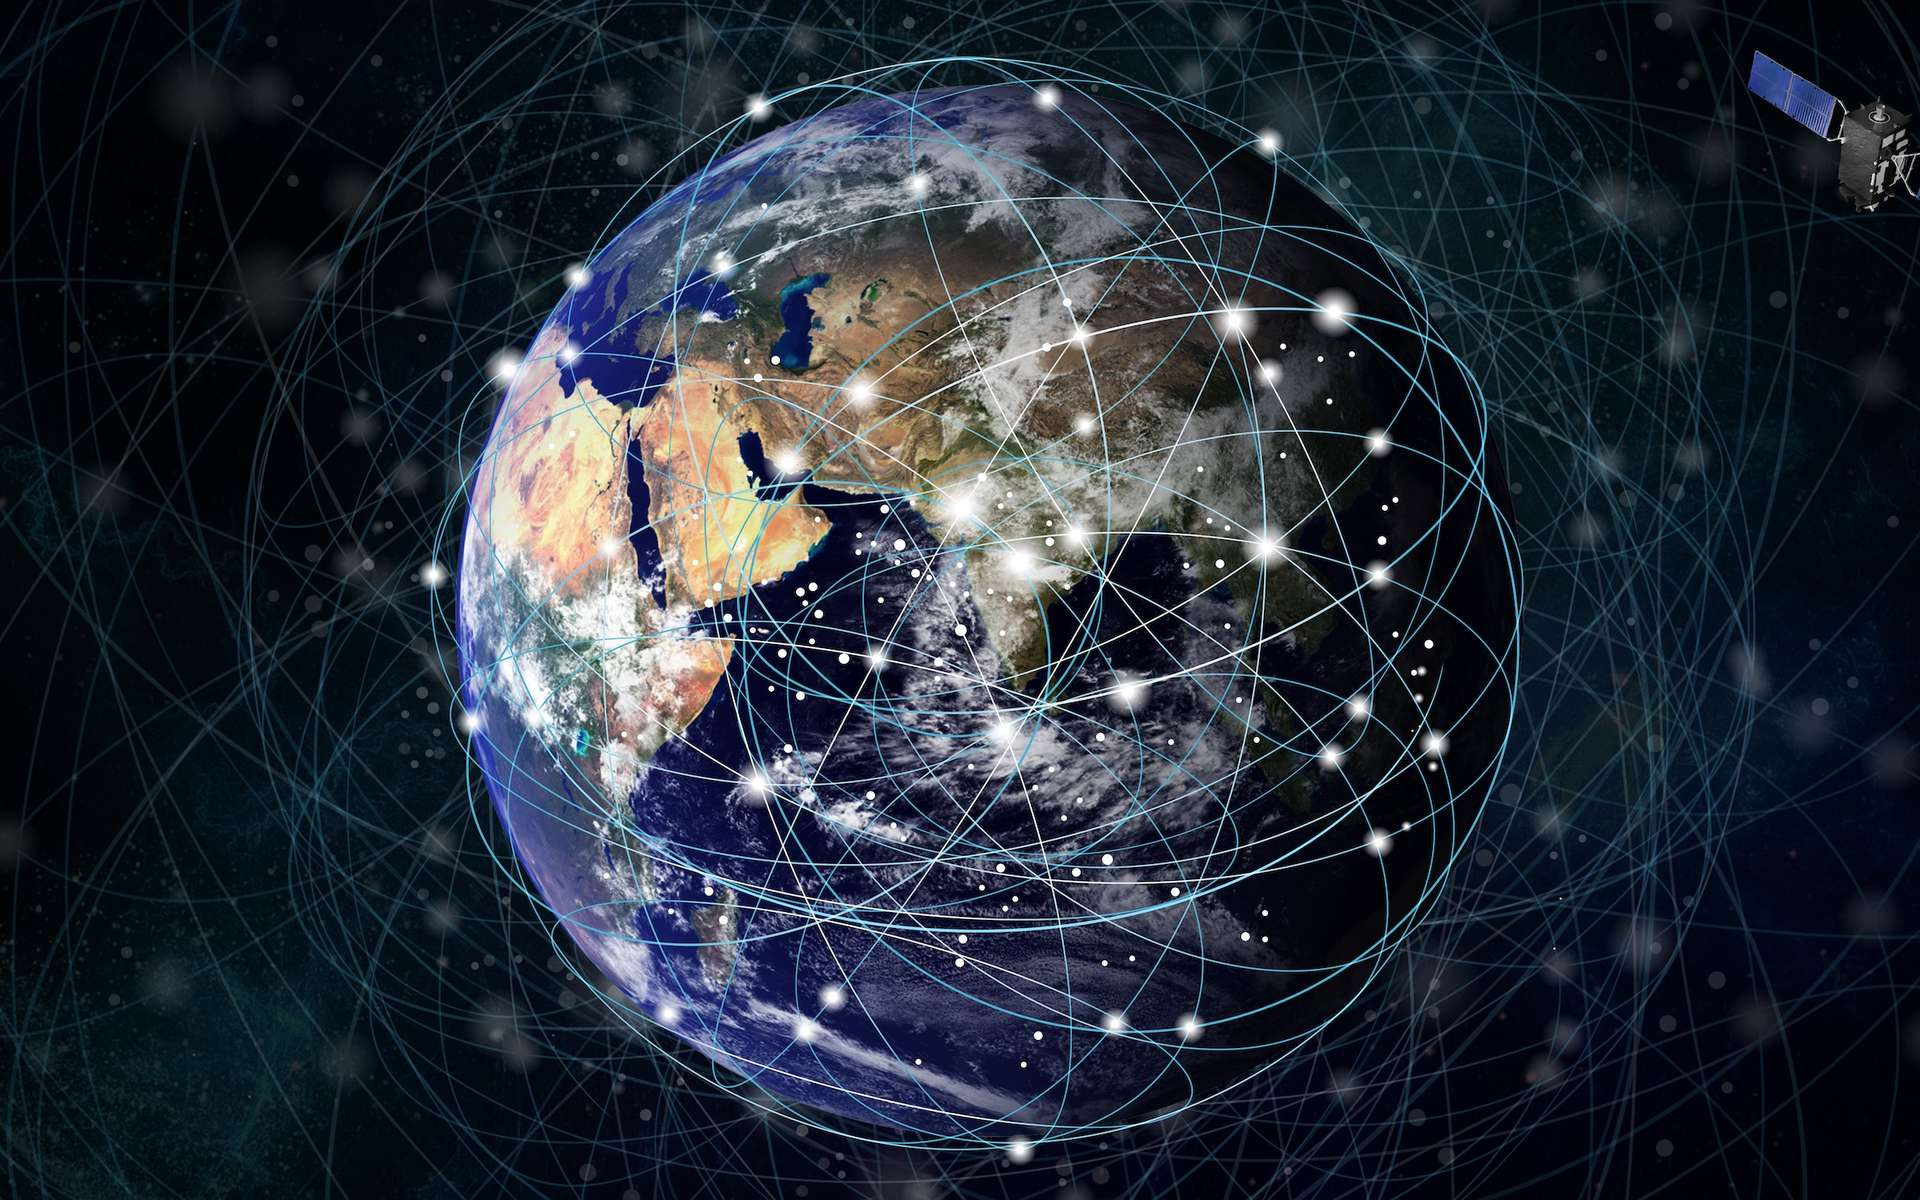 Les satellites de l'essaim Starlink gênent les observations astronomiques depuis le sol terrestre. © nana, Adobe Stock